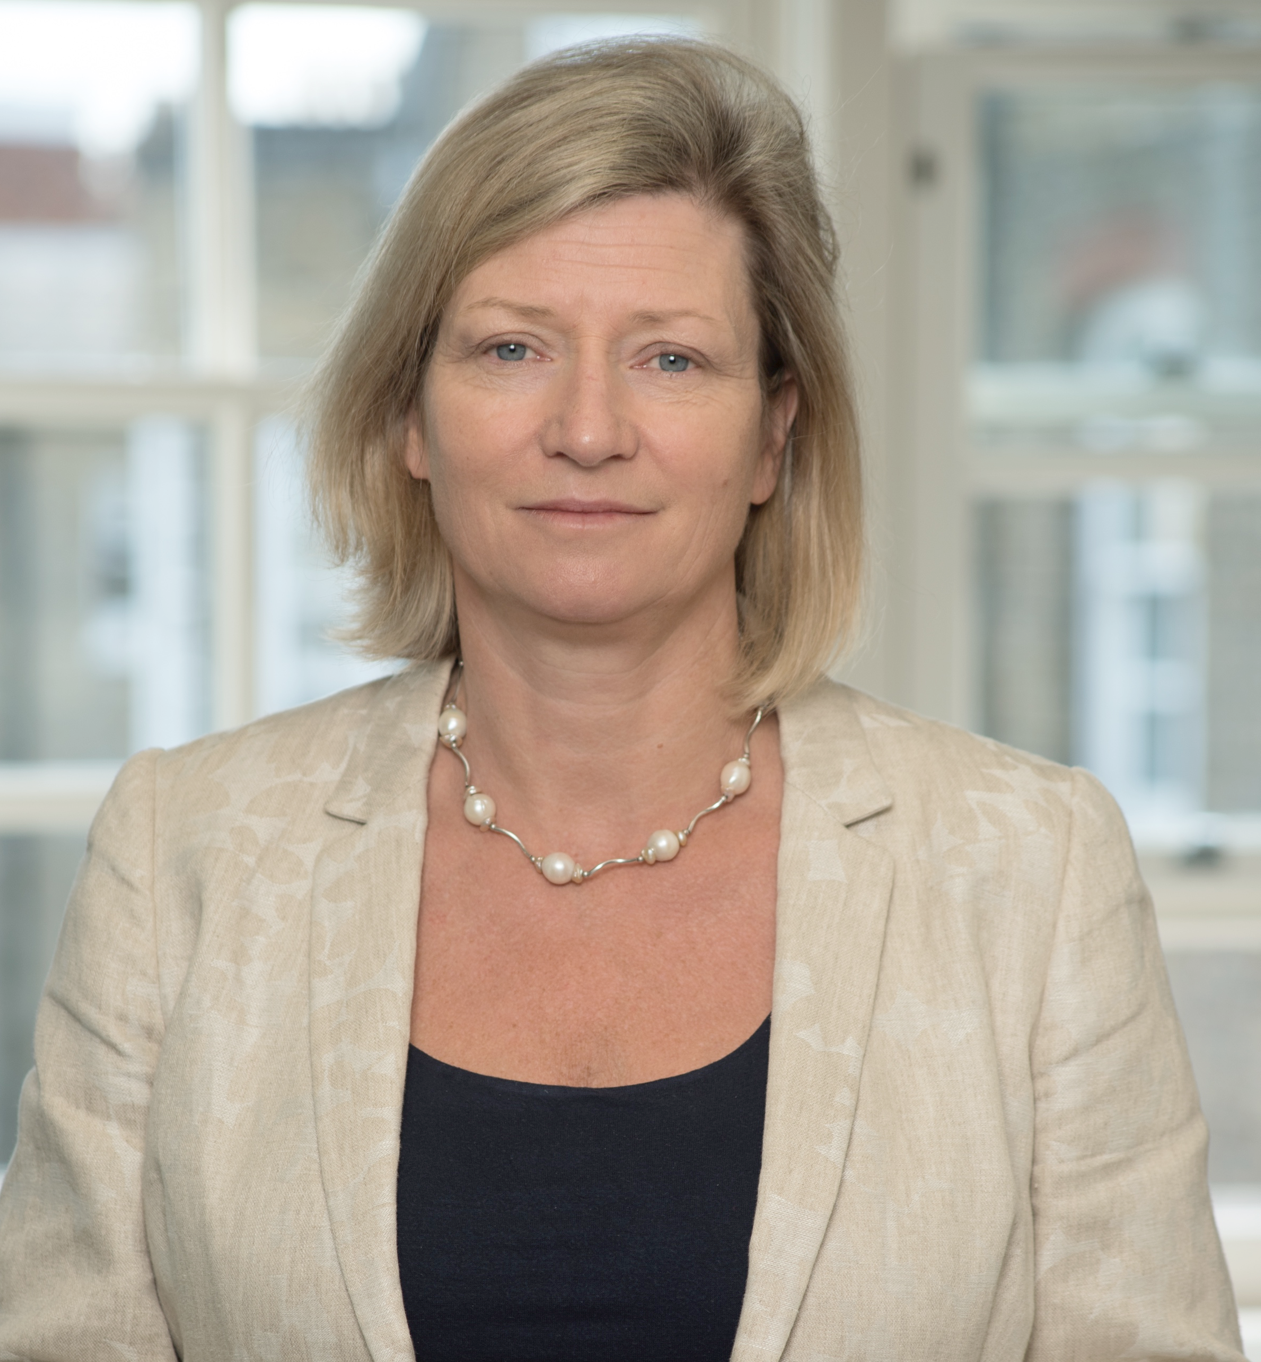 Echo chief executive Fiona MacAulay